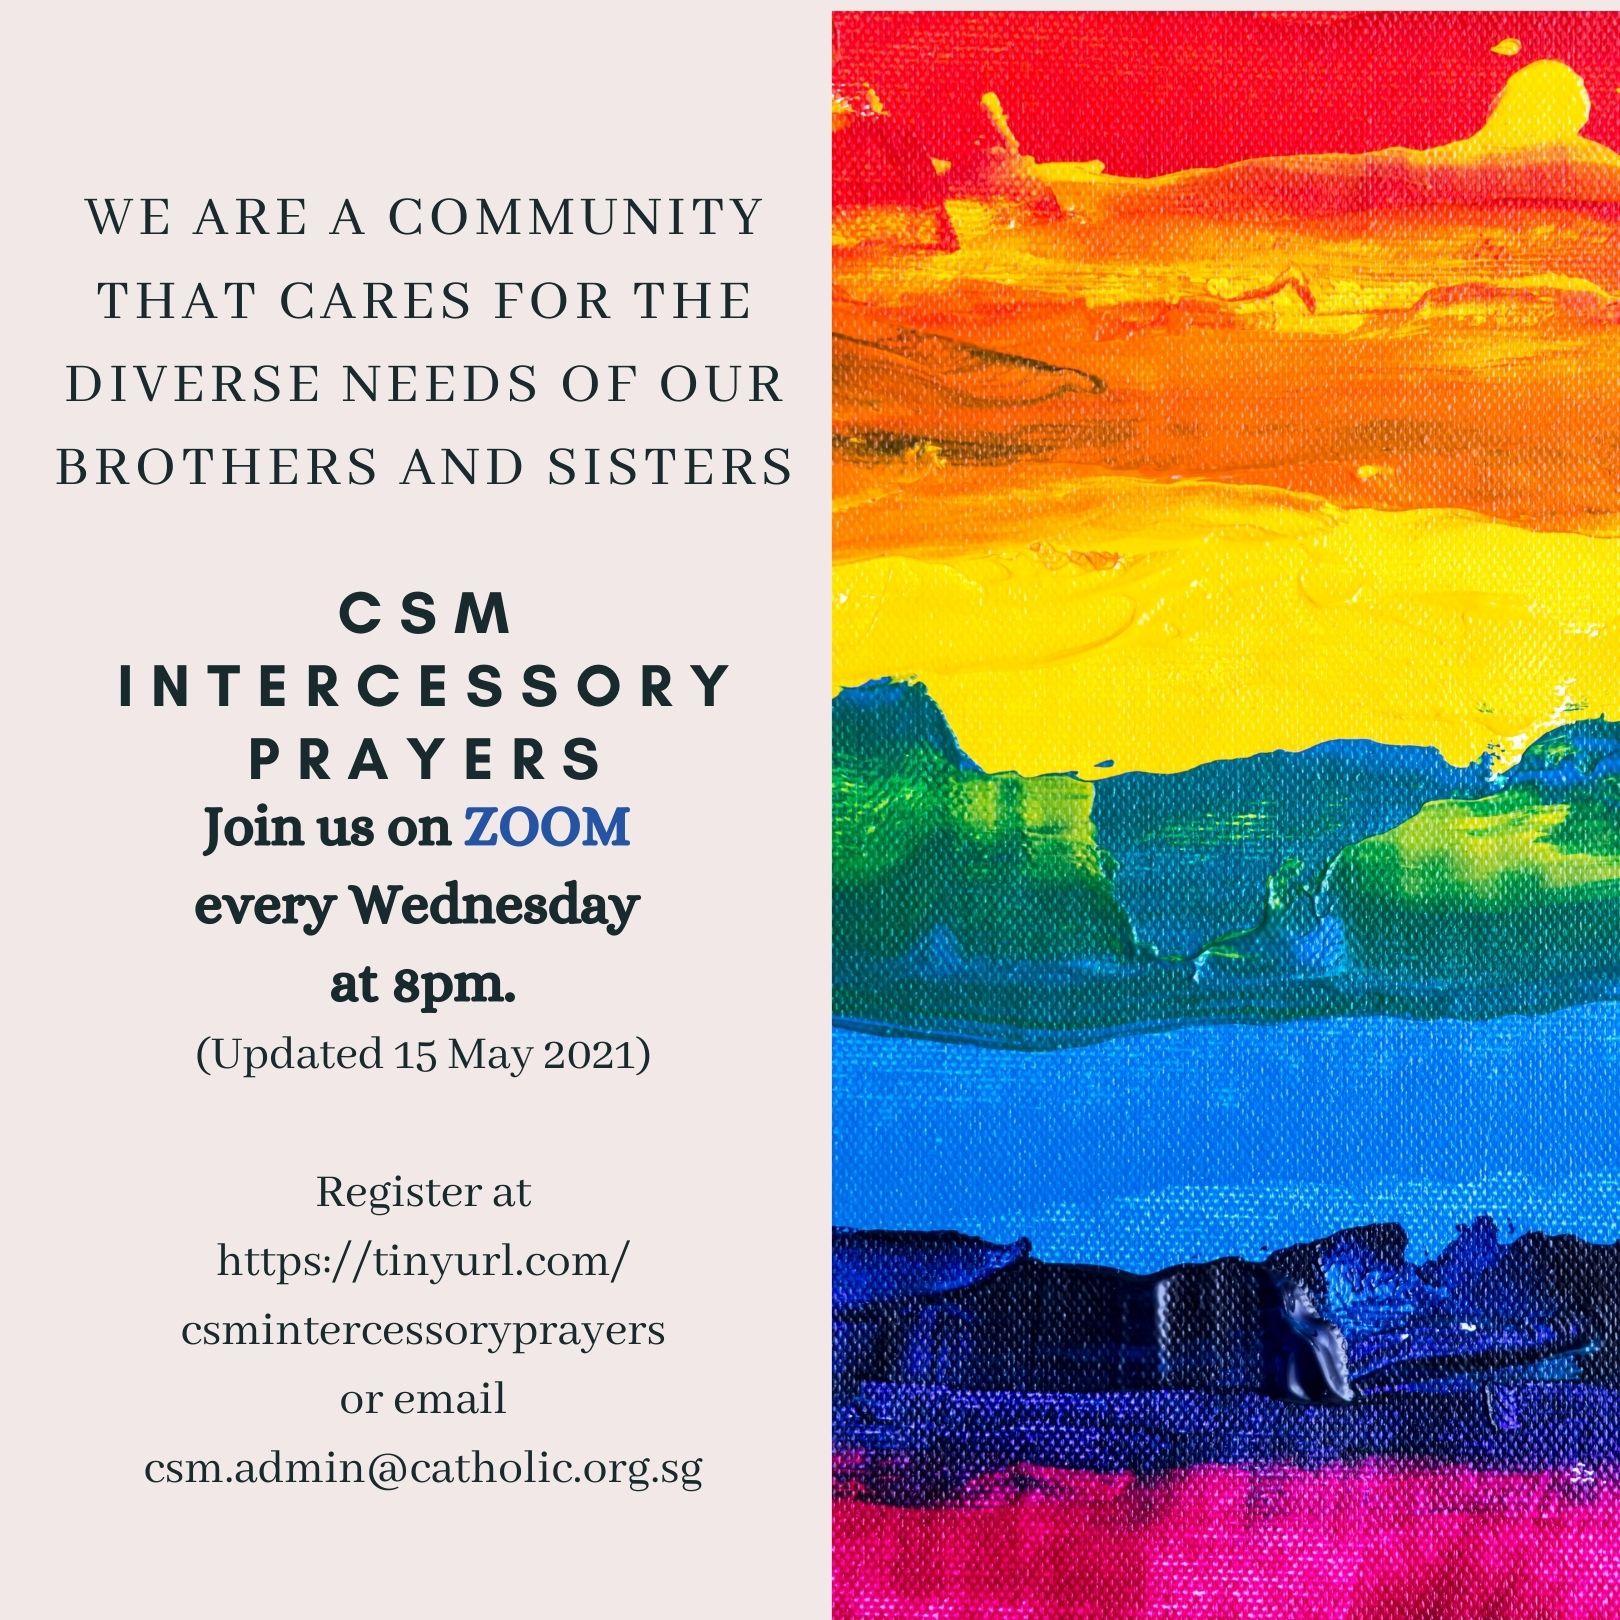 Intercessory Prayer Wed 8pm